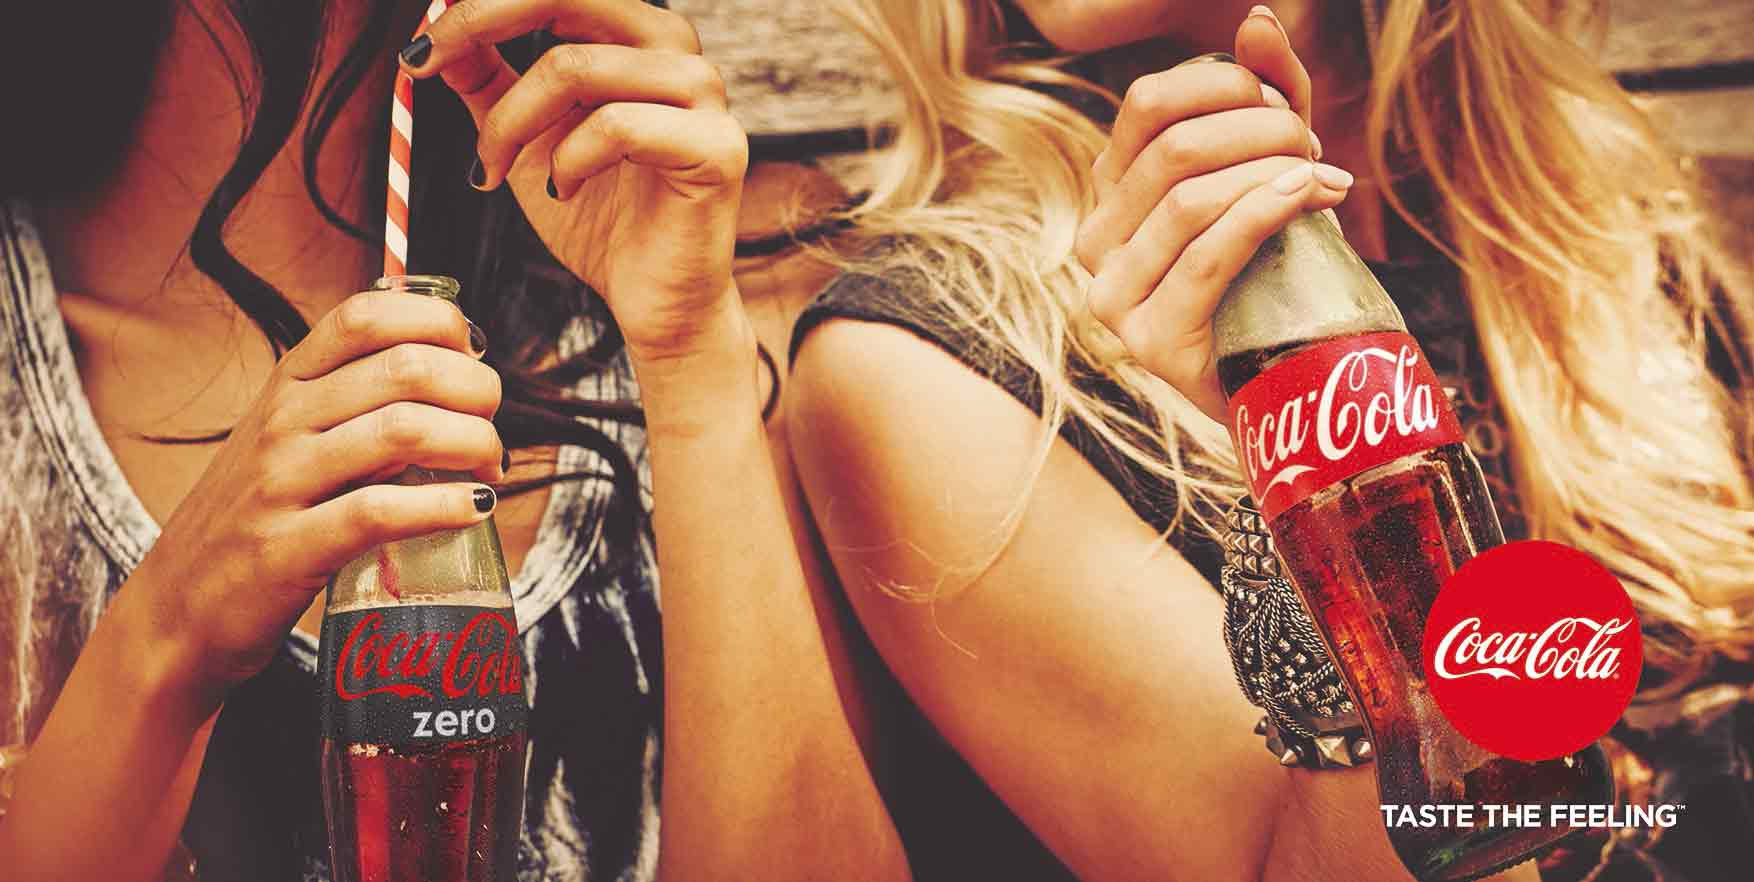 Gráfica Taste the feeling Coca Cola